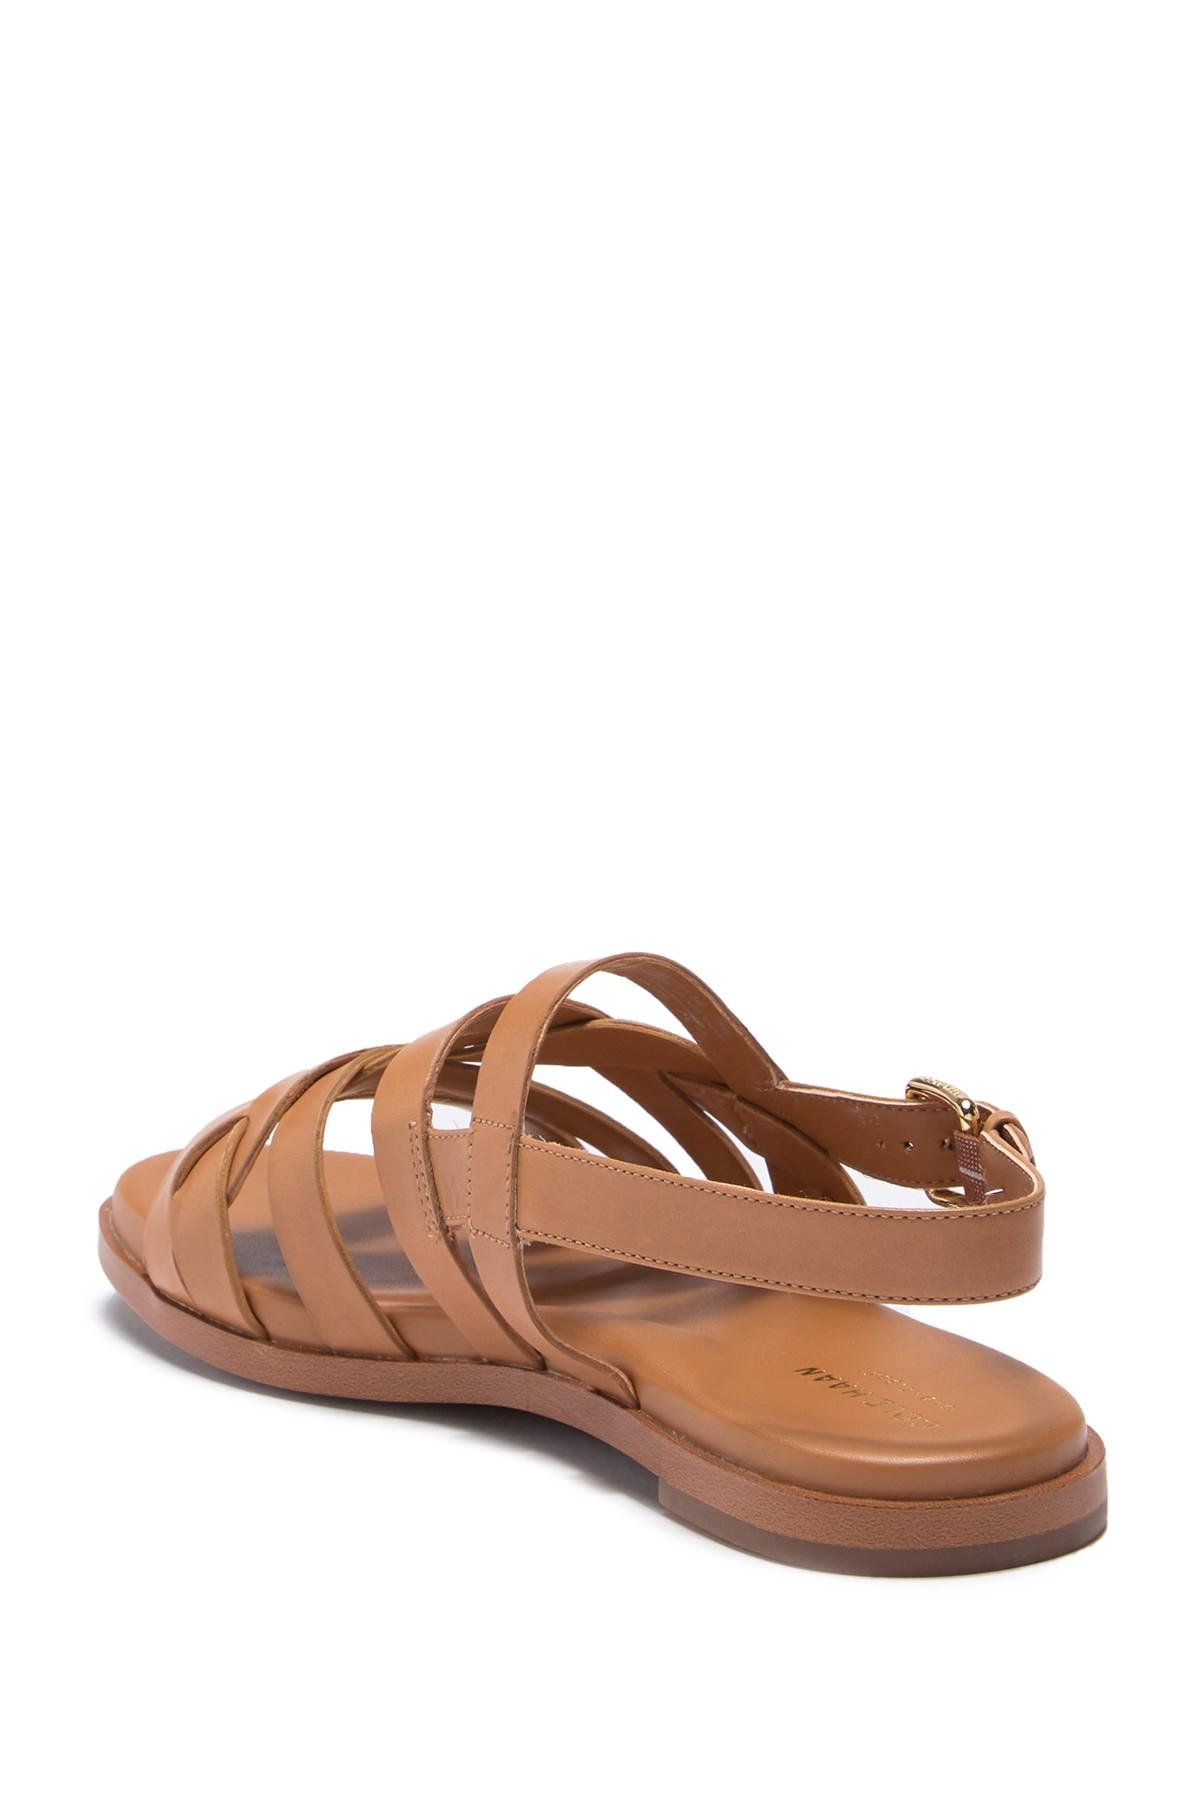 fdaf2d78a835 Cole Haan - Brown Braelyn Grand Braided Flat Sandal - Lyst. View fullscreen